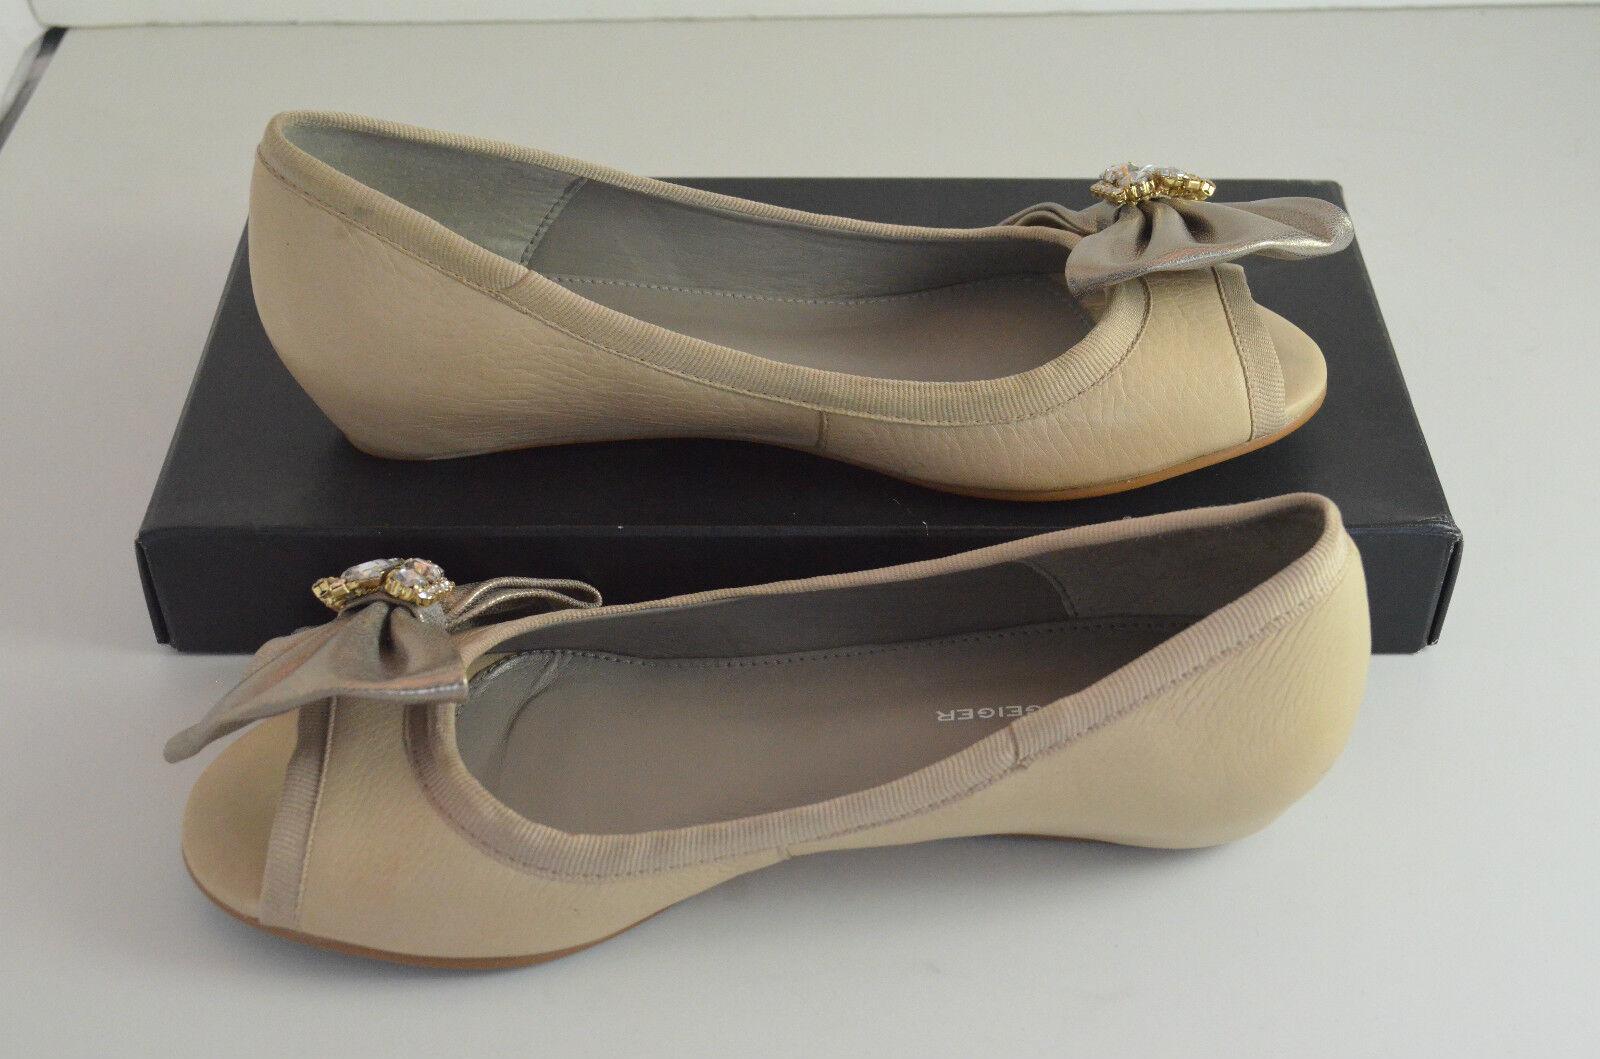 nib prada en cuir noir - interversion cheville wedge wedge wedge talon marque modèle du best - seller sandales 36,5 ef2e64